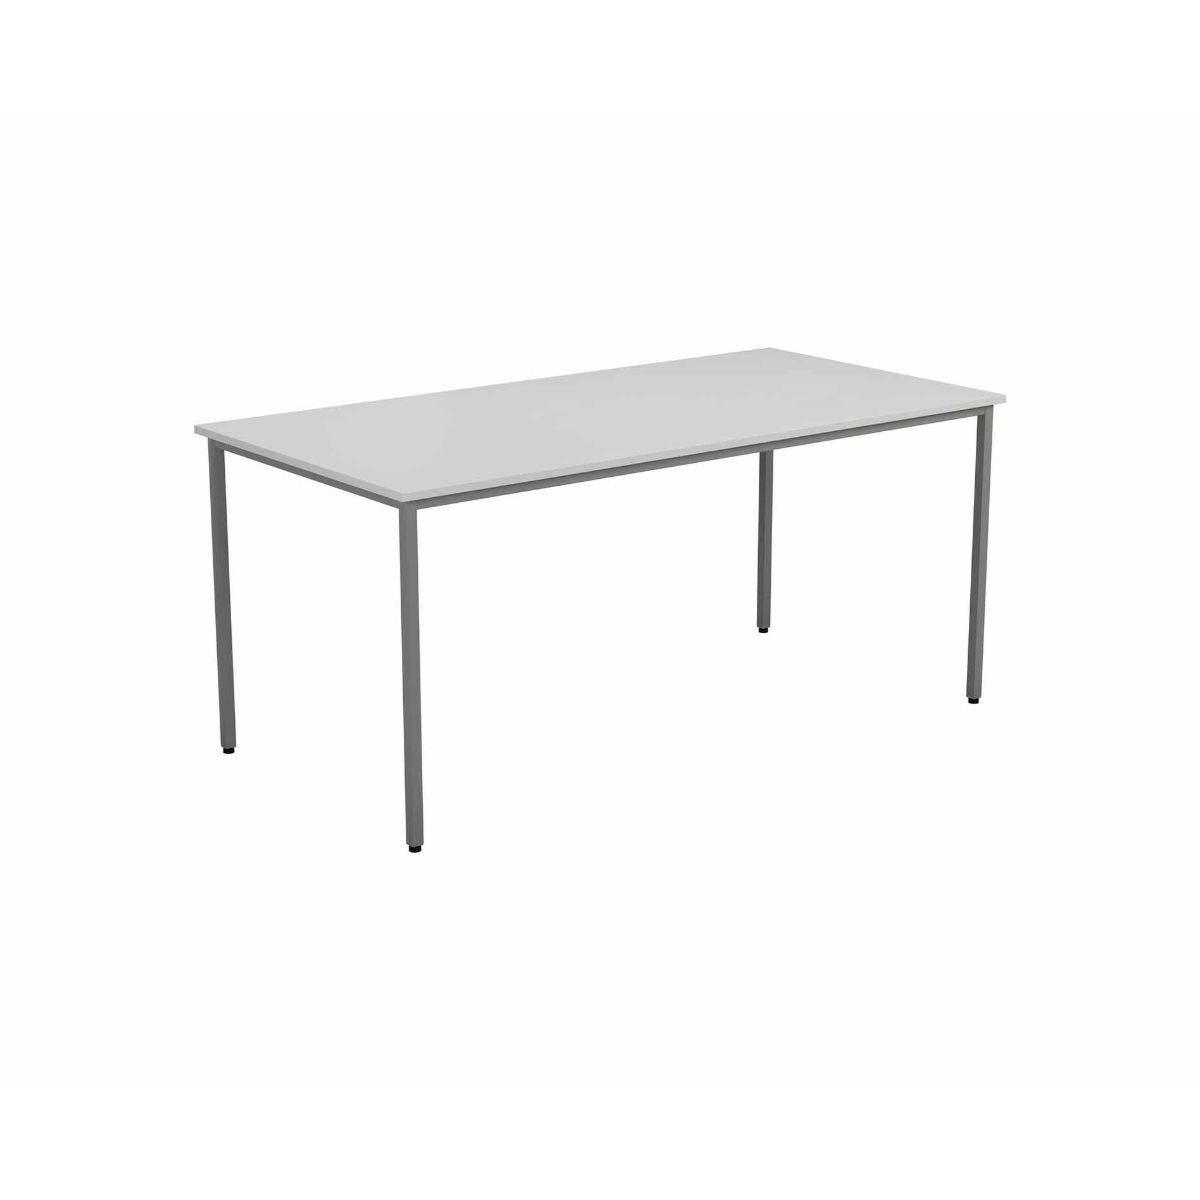 TC Office Rectangular Table 1600 x 800mm White